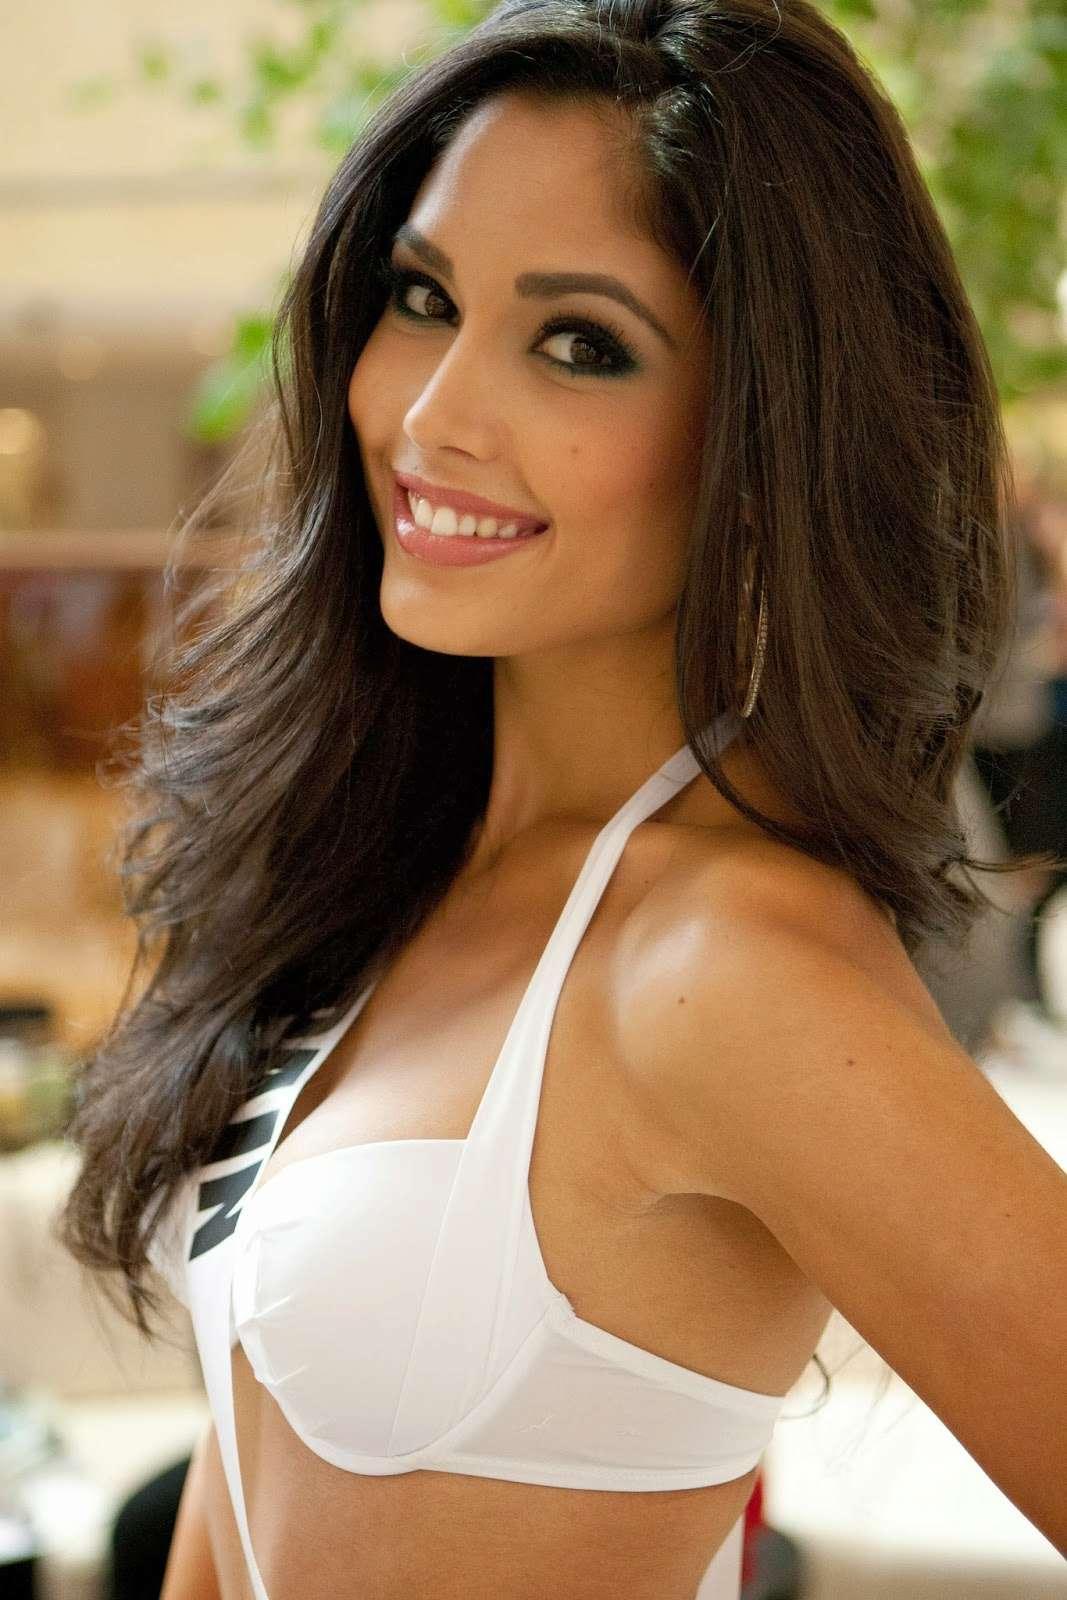 patricia yurena rodriguez, miss espana 2008/2013, 1st runner-up de miss universe 2013. - Página 5 Uni20115